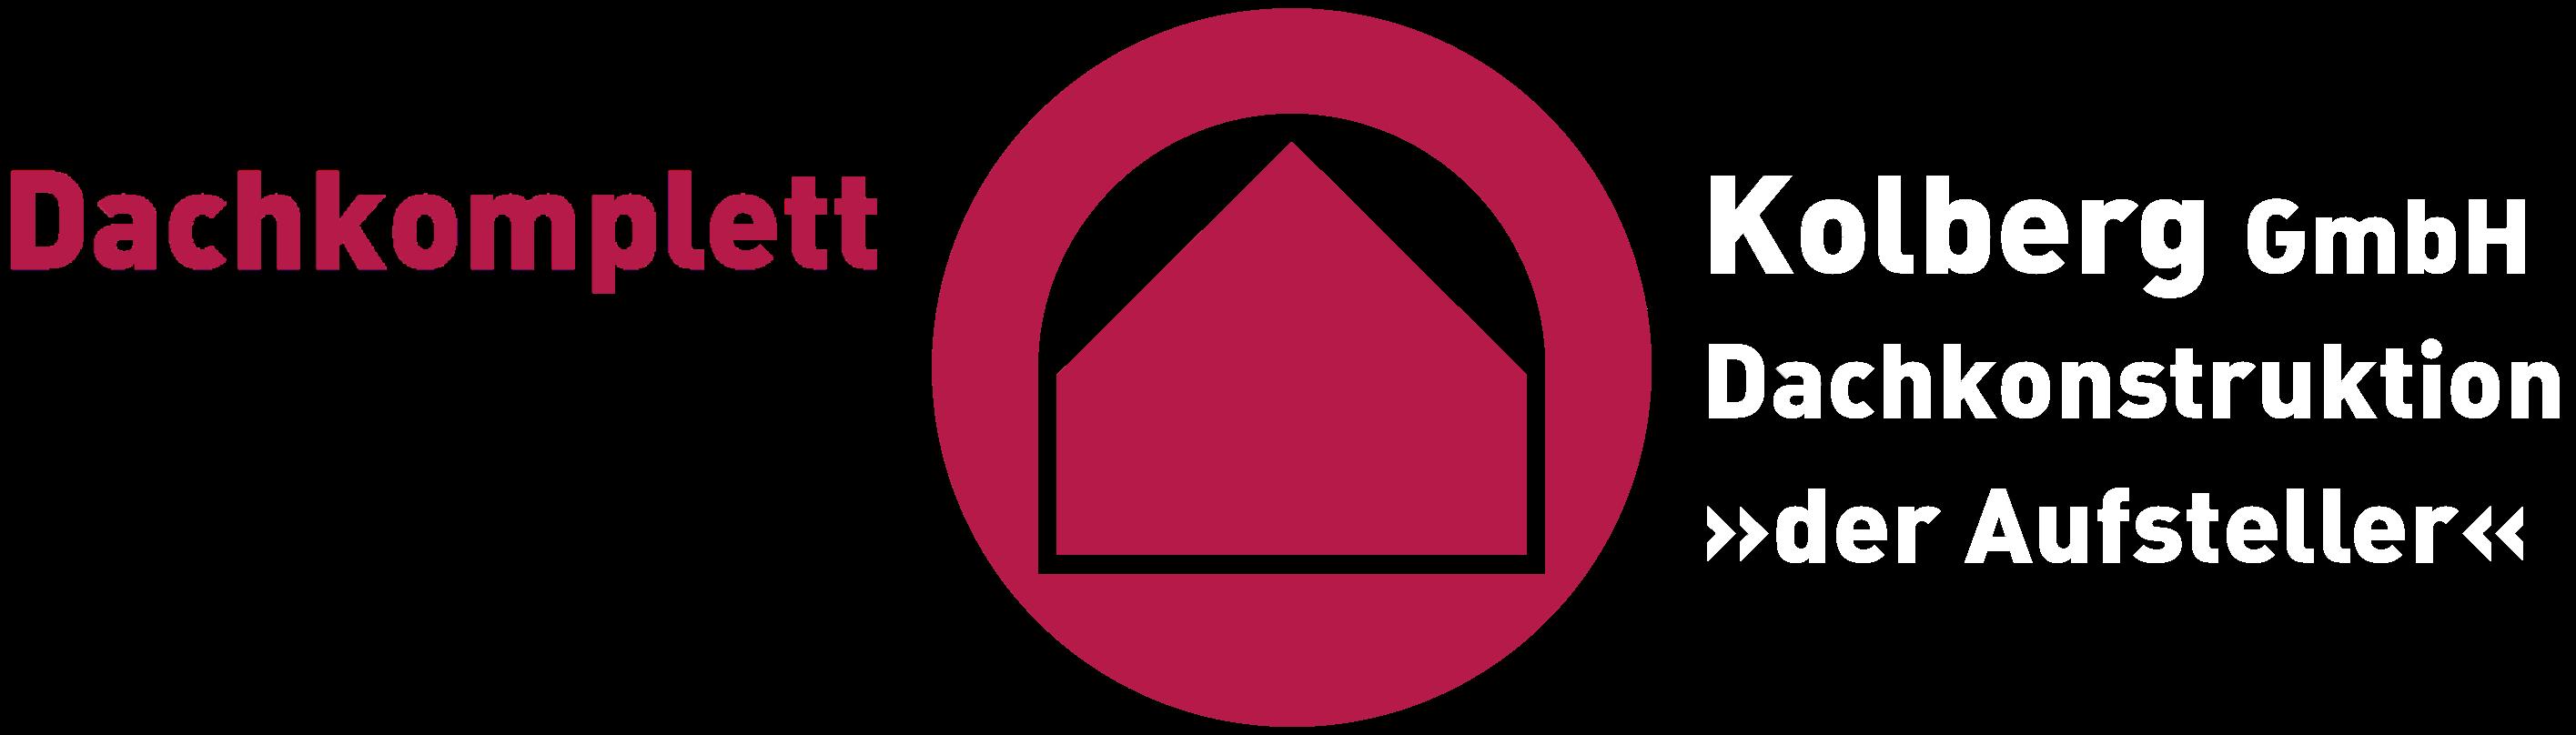 Kolberg GmbH